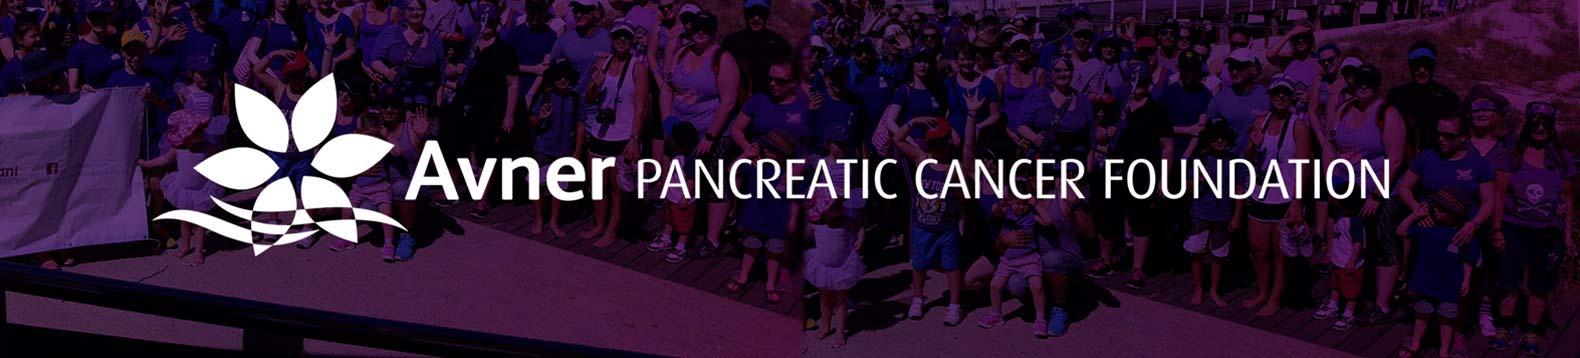 Avner Pancreatic Cancer Foundation